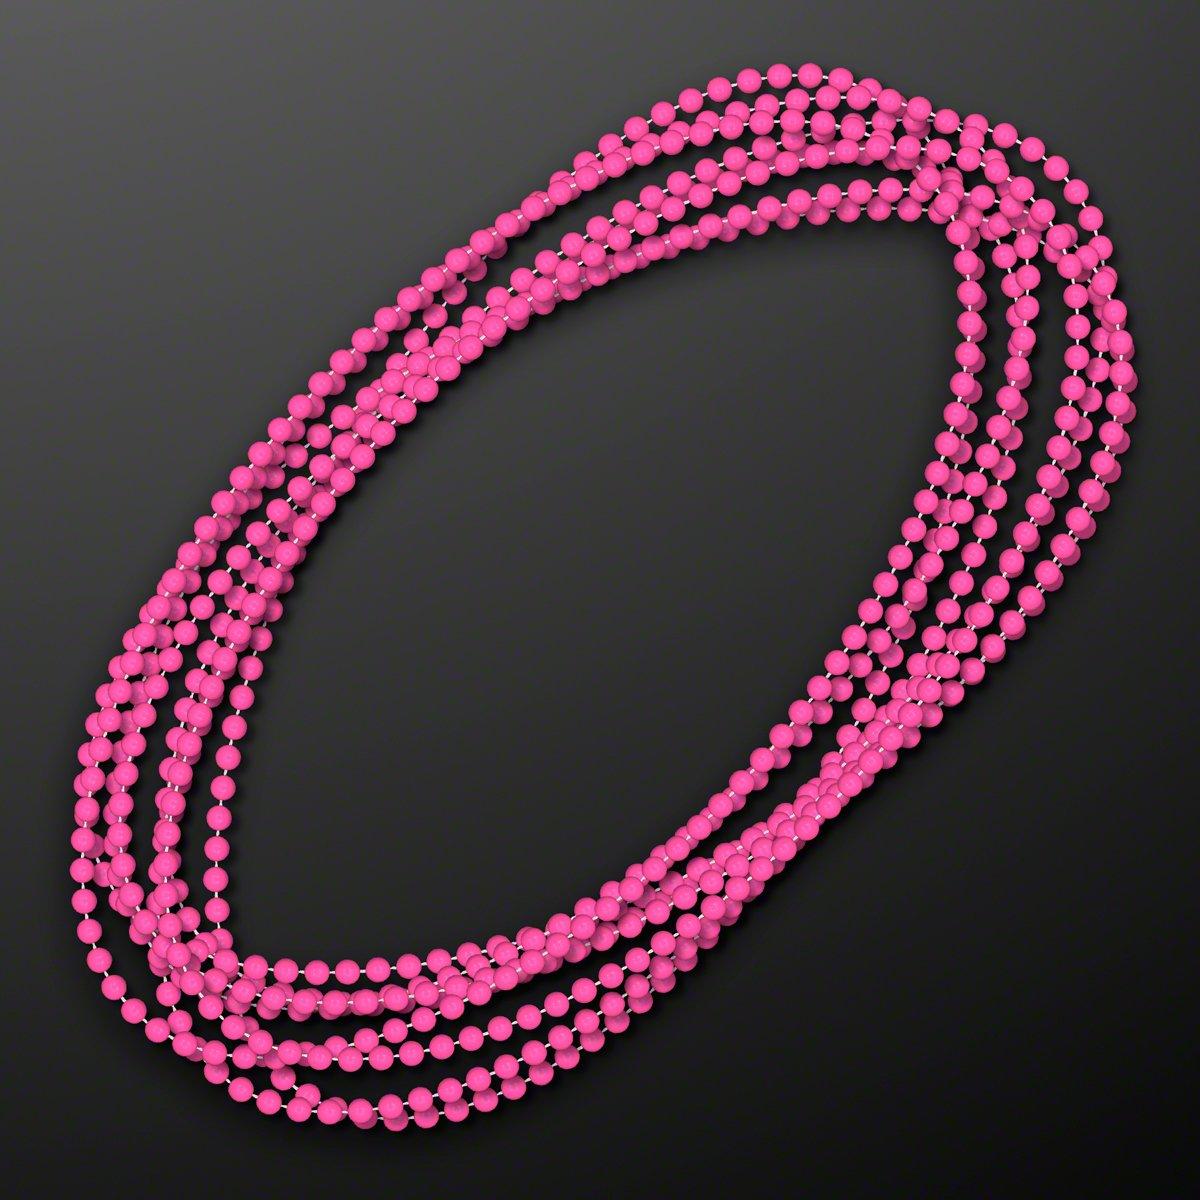 FlashingBlinkyLights Pink Round Ball Mardi Gras Bead Necklaces (Set of 144)